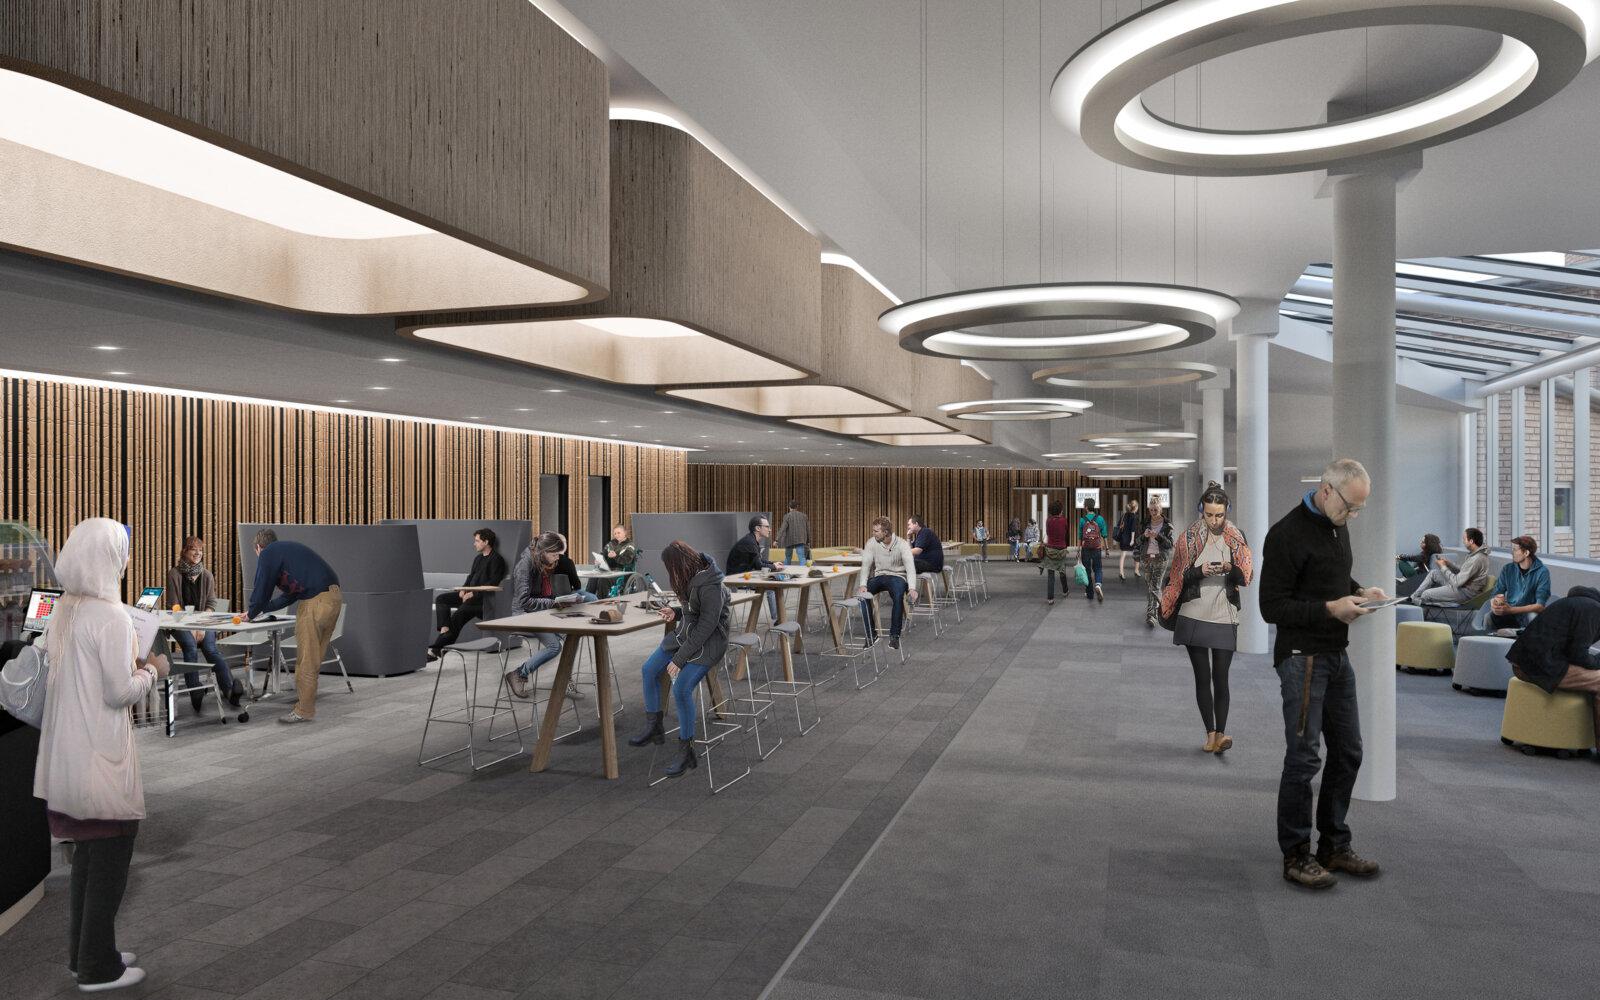 Heriot-Watt University James Watt Centre collaborative area CGI